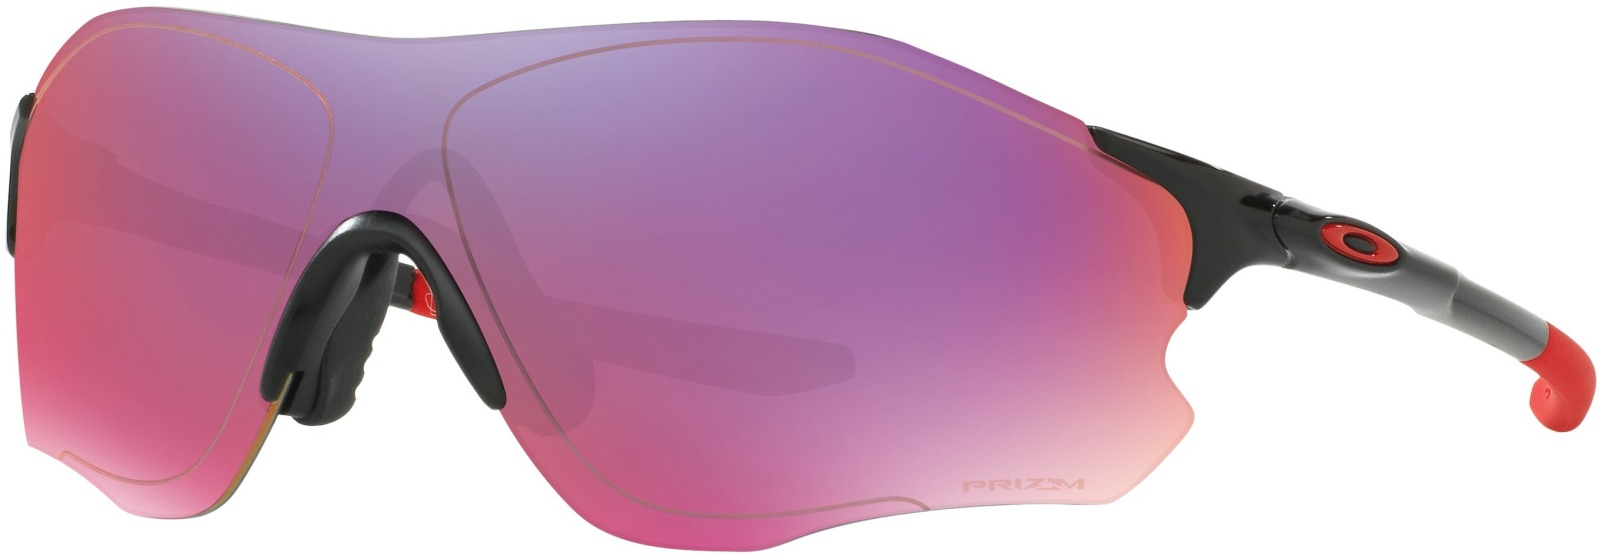 42d470b0f4 Oakley EVZero Path Prizm Road Sunglasses - Eyewear - Cycle SuperStore